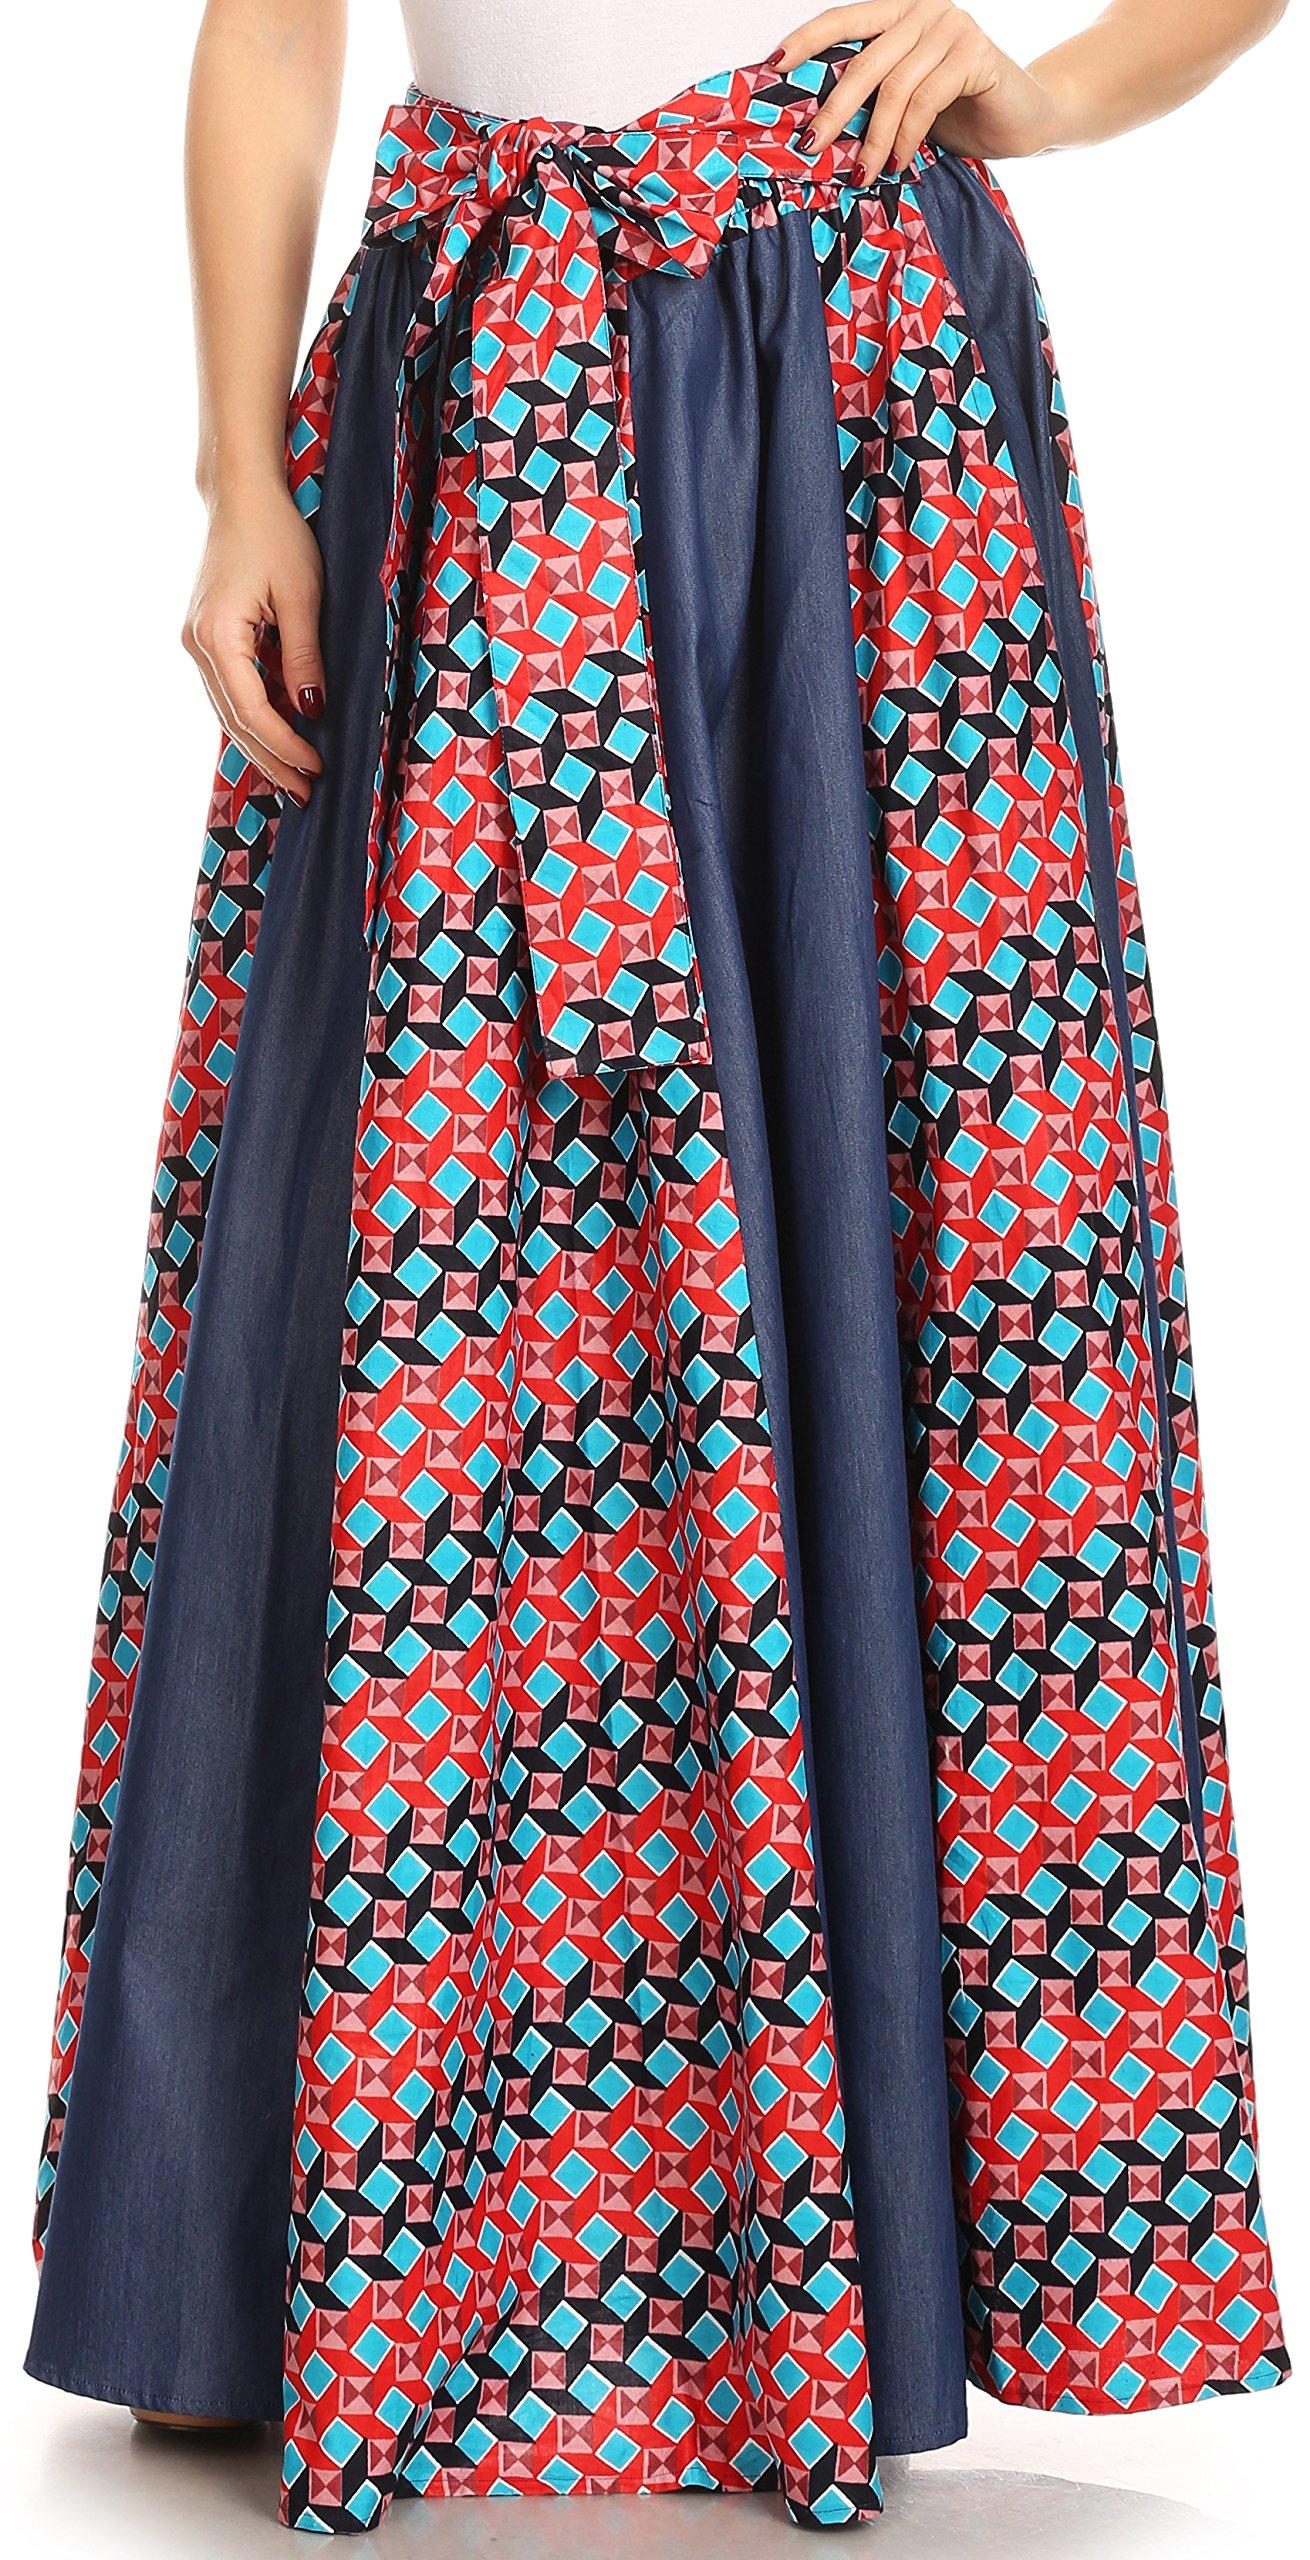 Sakkas W17617 - Monifa Long Maxi Skirt colorful Ankara Wax Dutch African Skirt Gorgeous - 2293 Red/Turq-Tile - OS